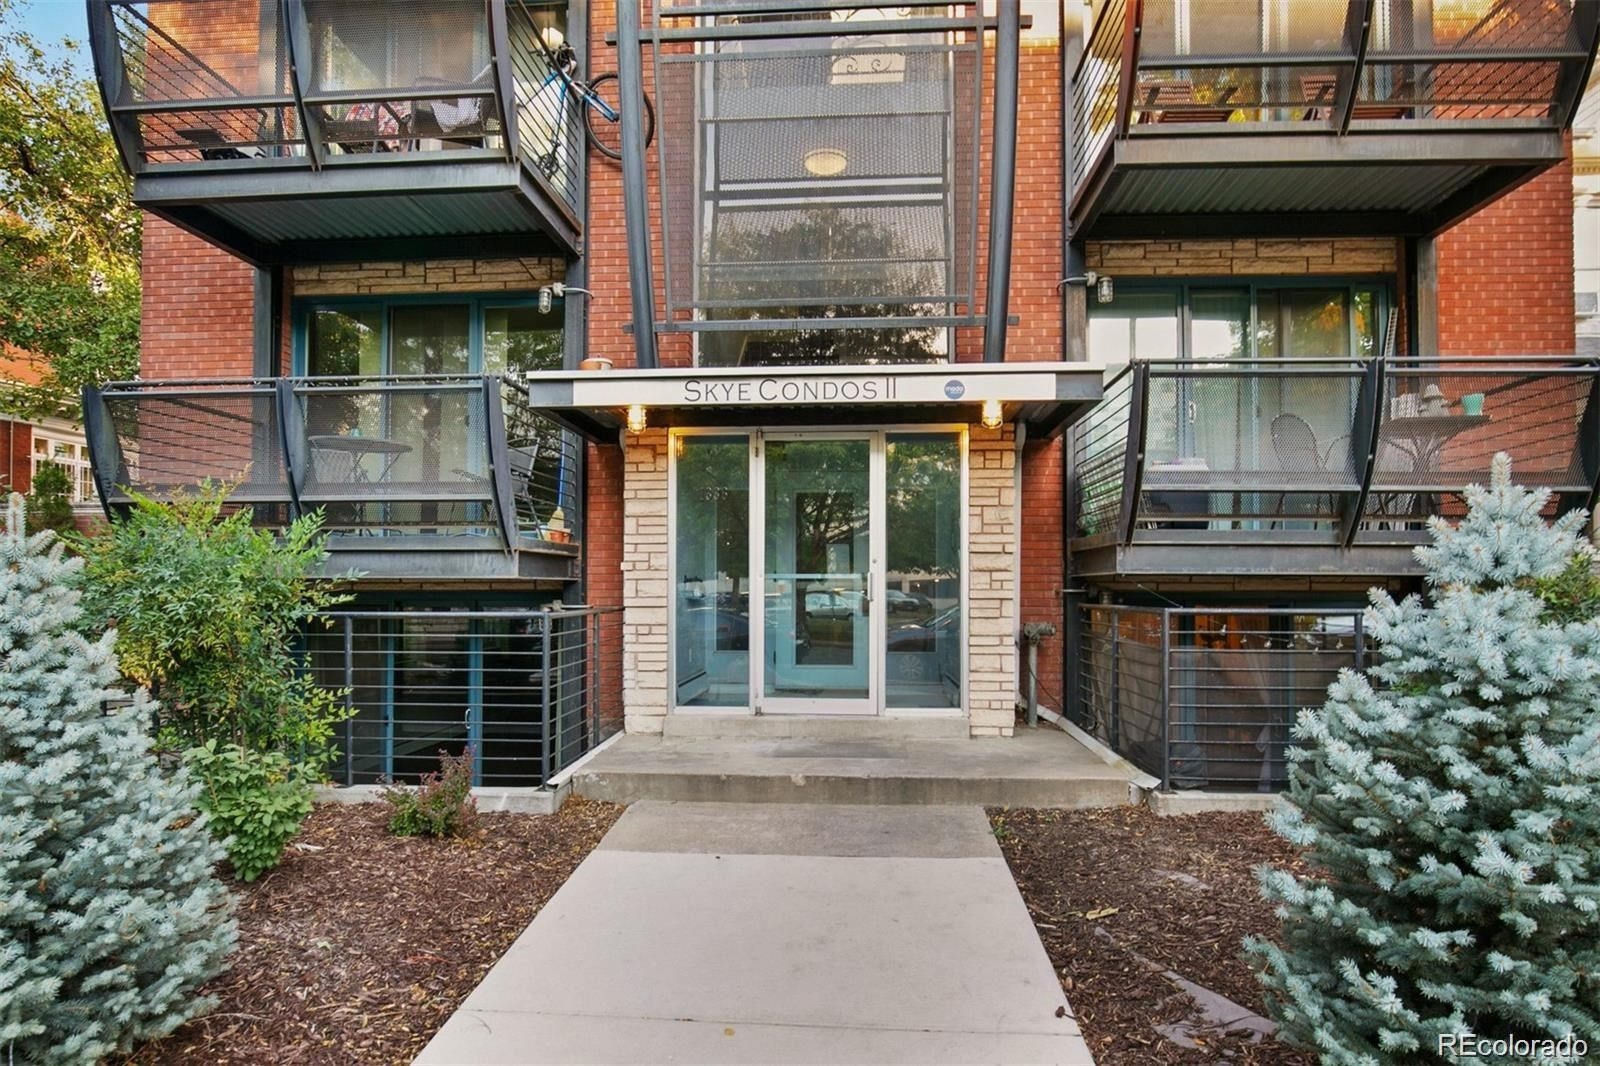 Photo of 1336 N Logan Street #101, Denver, CO 80203 (MLS # 7394053)